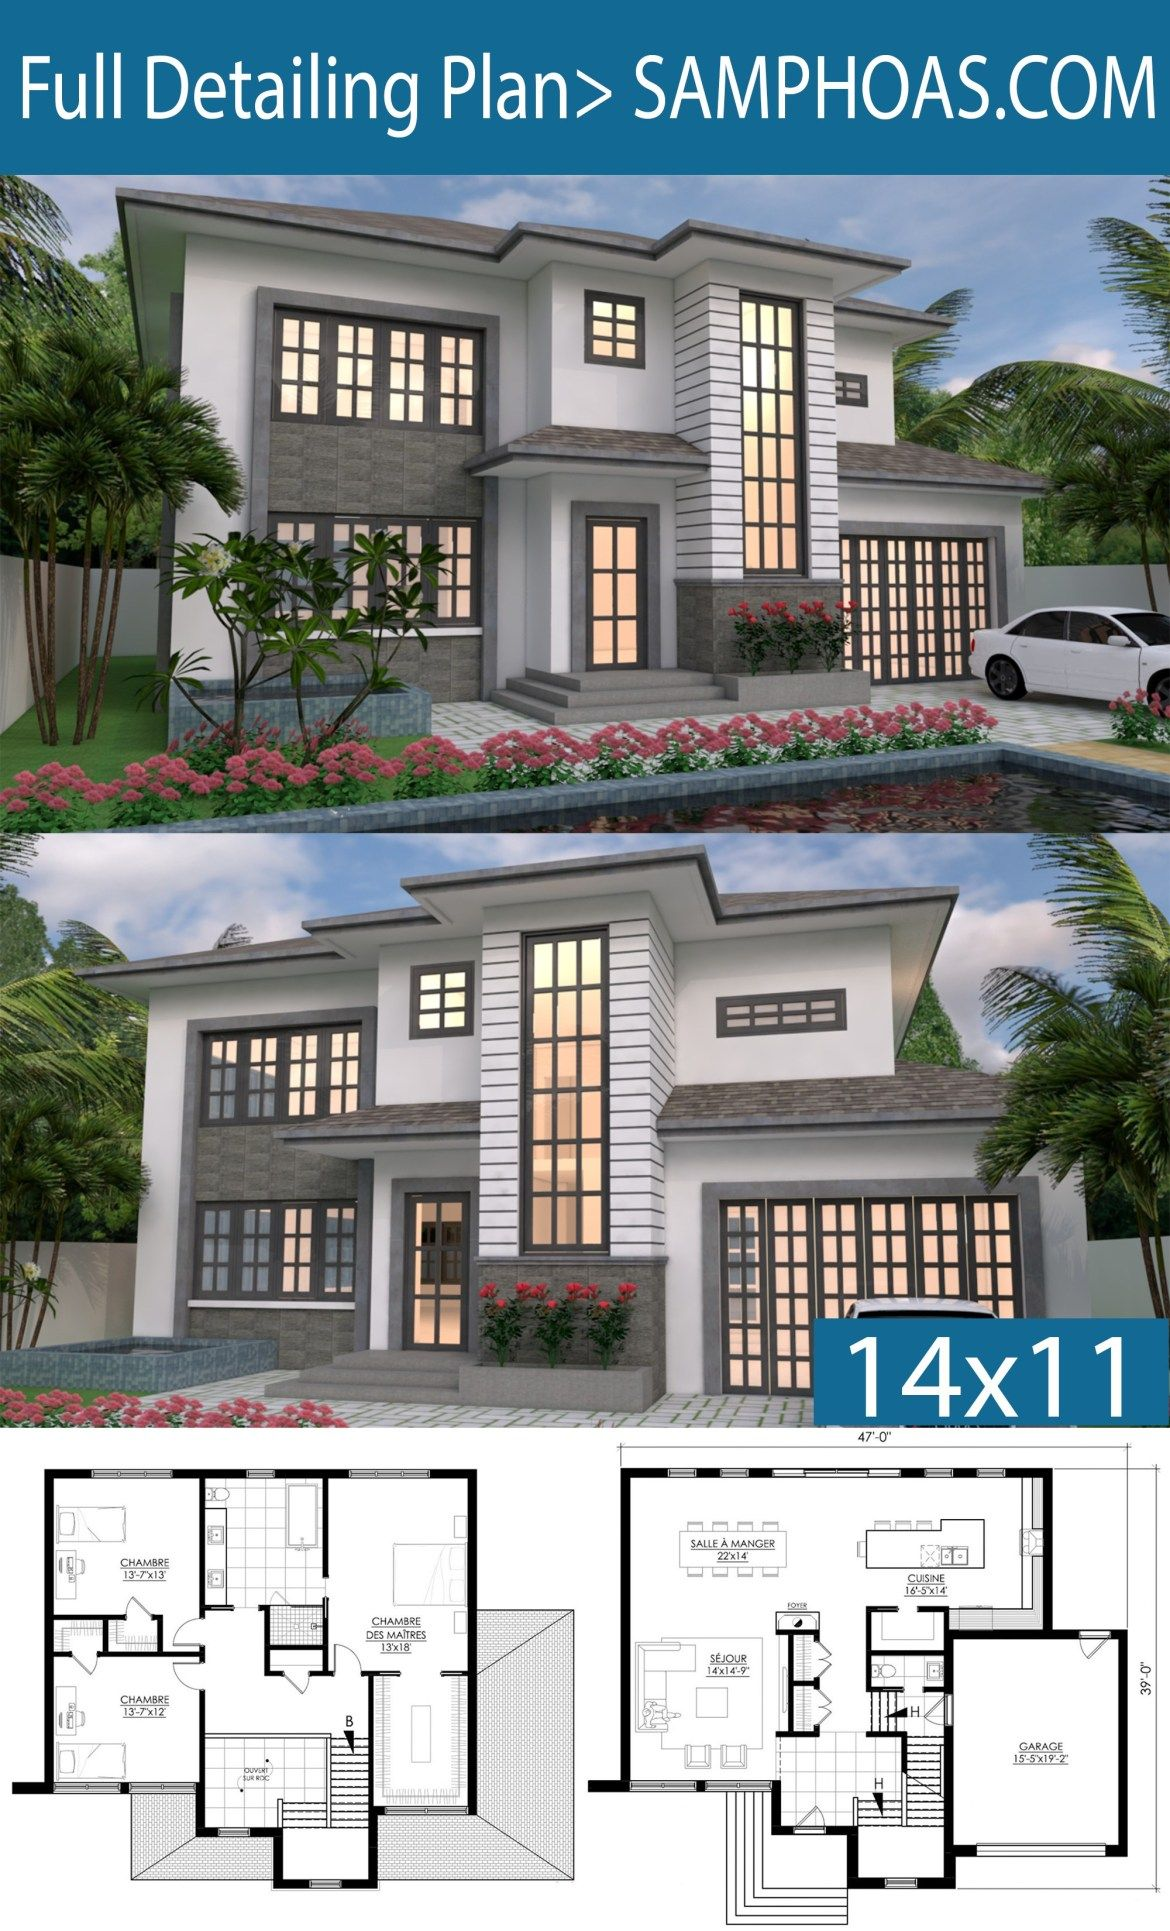 2 Story House Design 14x11m Samphoas Plansearch 2 Story House